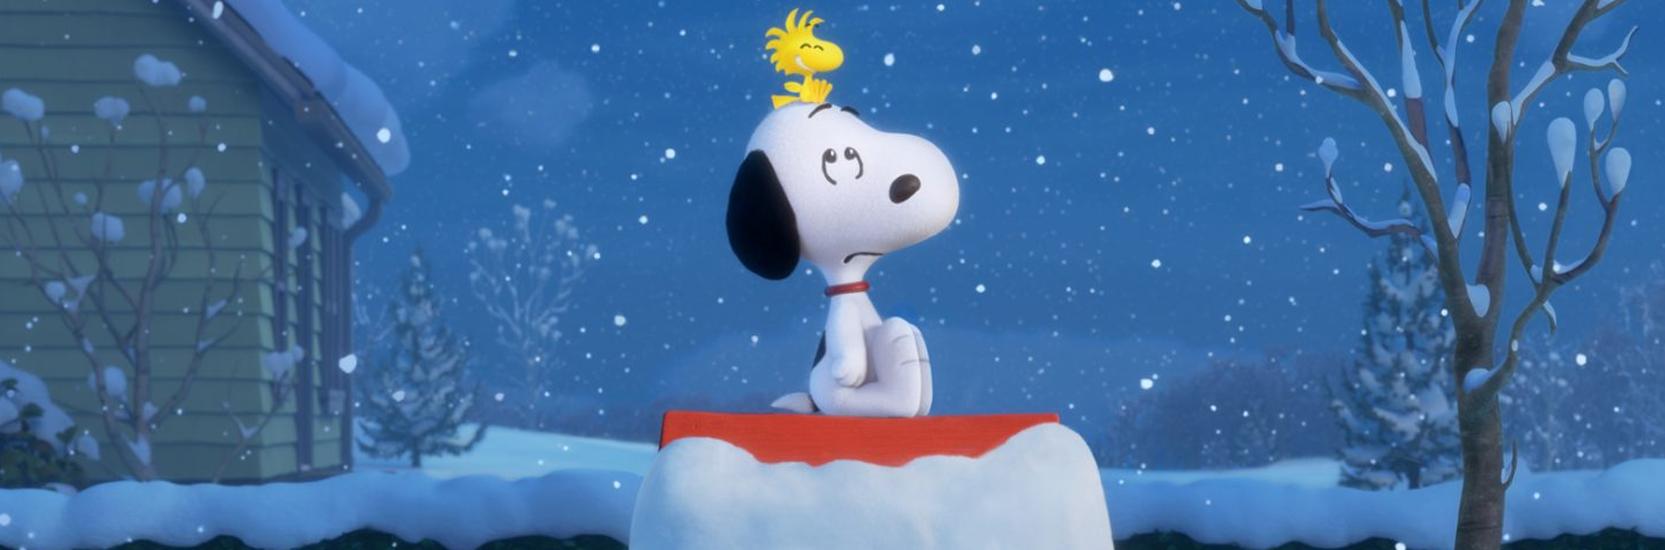 Peanuts : Blue Sky dévoile son Snoopy !